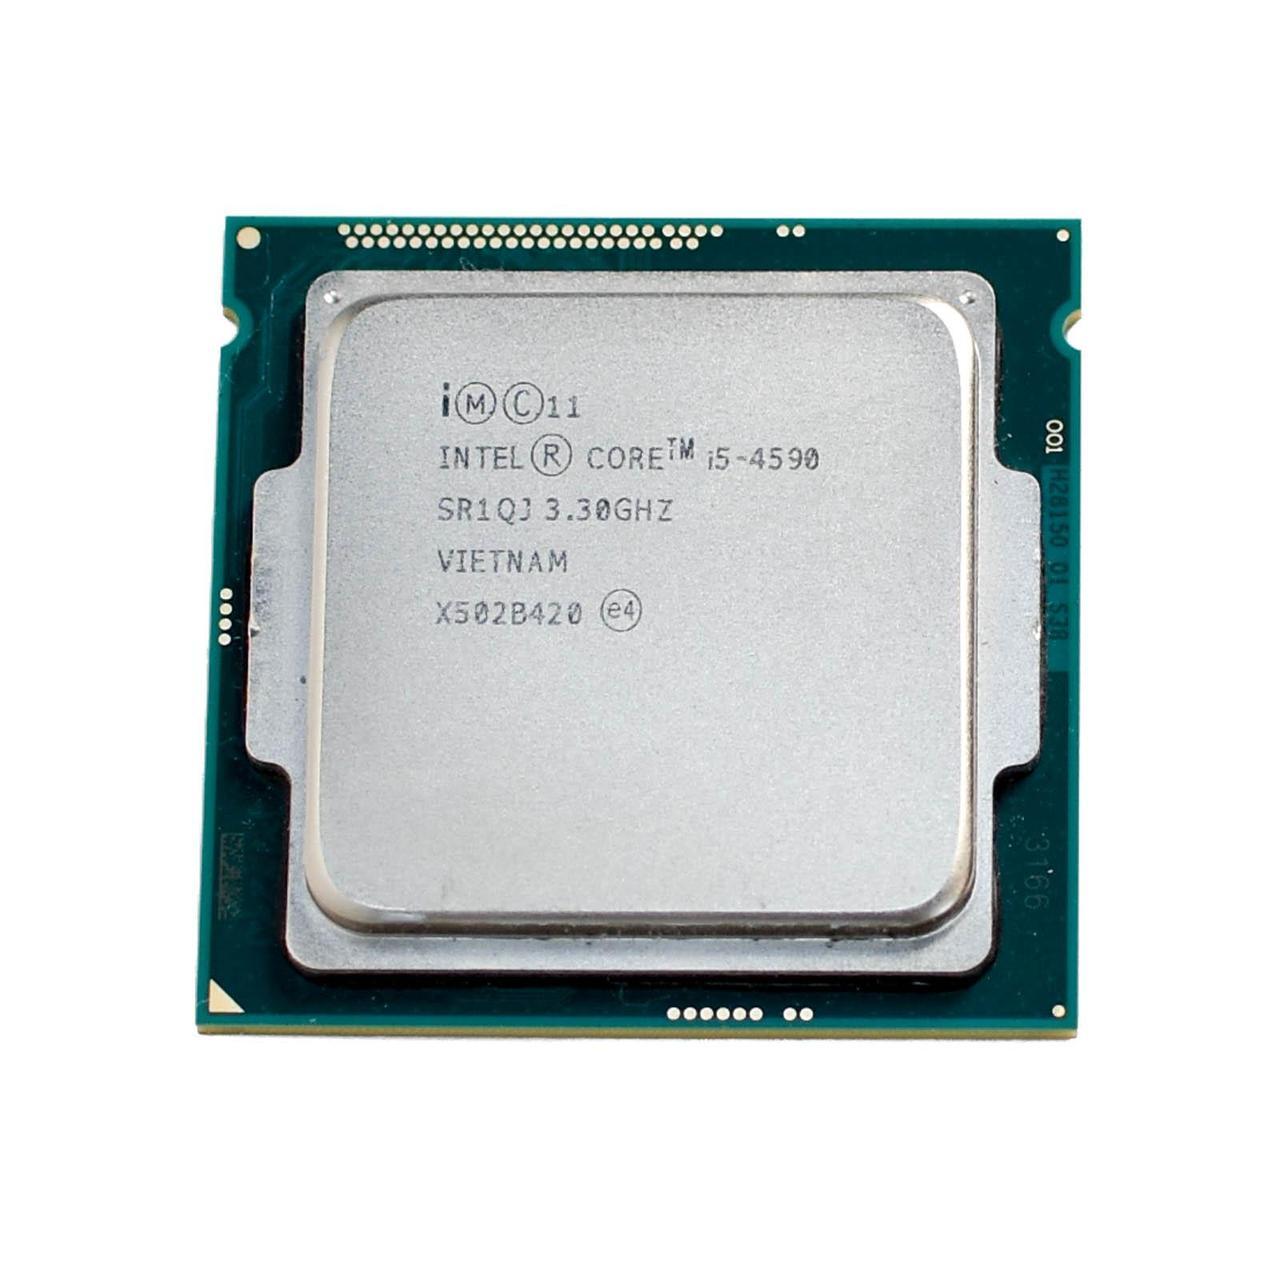 Процессор Intel Core i5-4590 3.30GHz (SR1QJ) s1150, tray